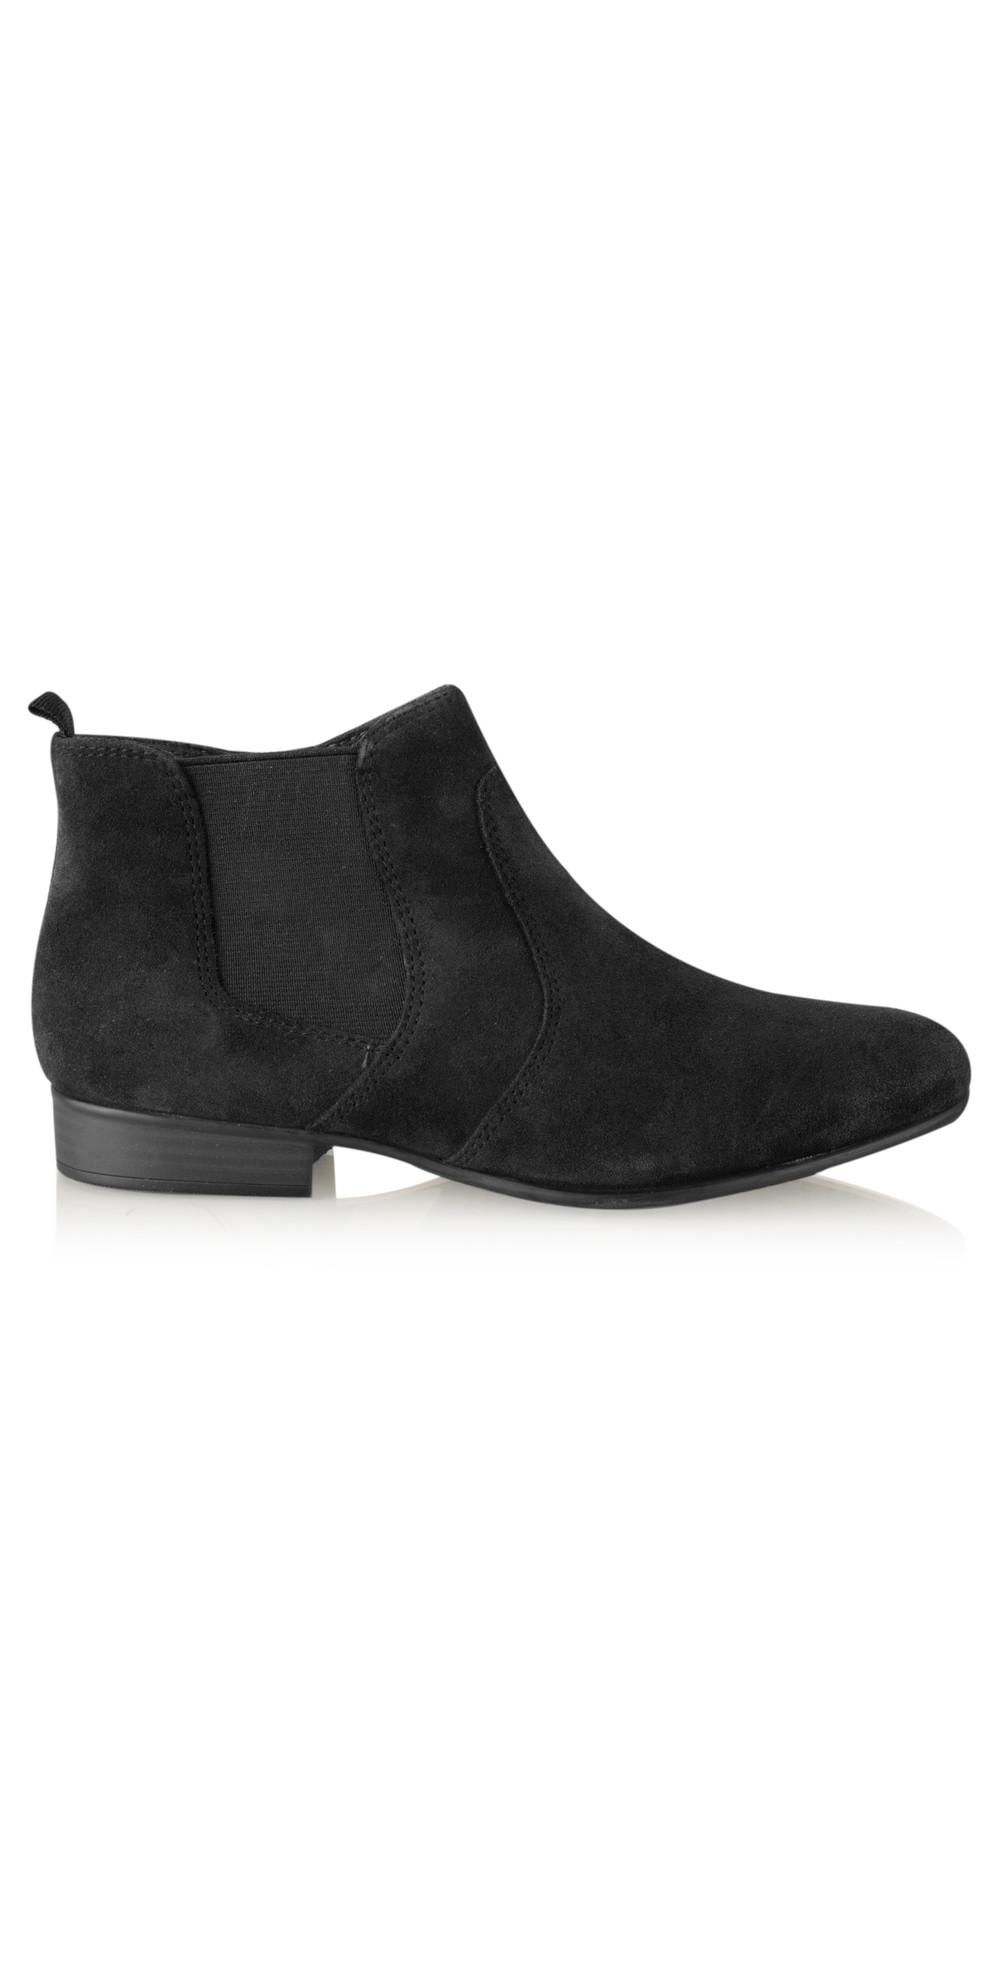 tamaris suede ankle boot in black. Black Bedroom Furniture Sets. Home Design Ideas